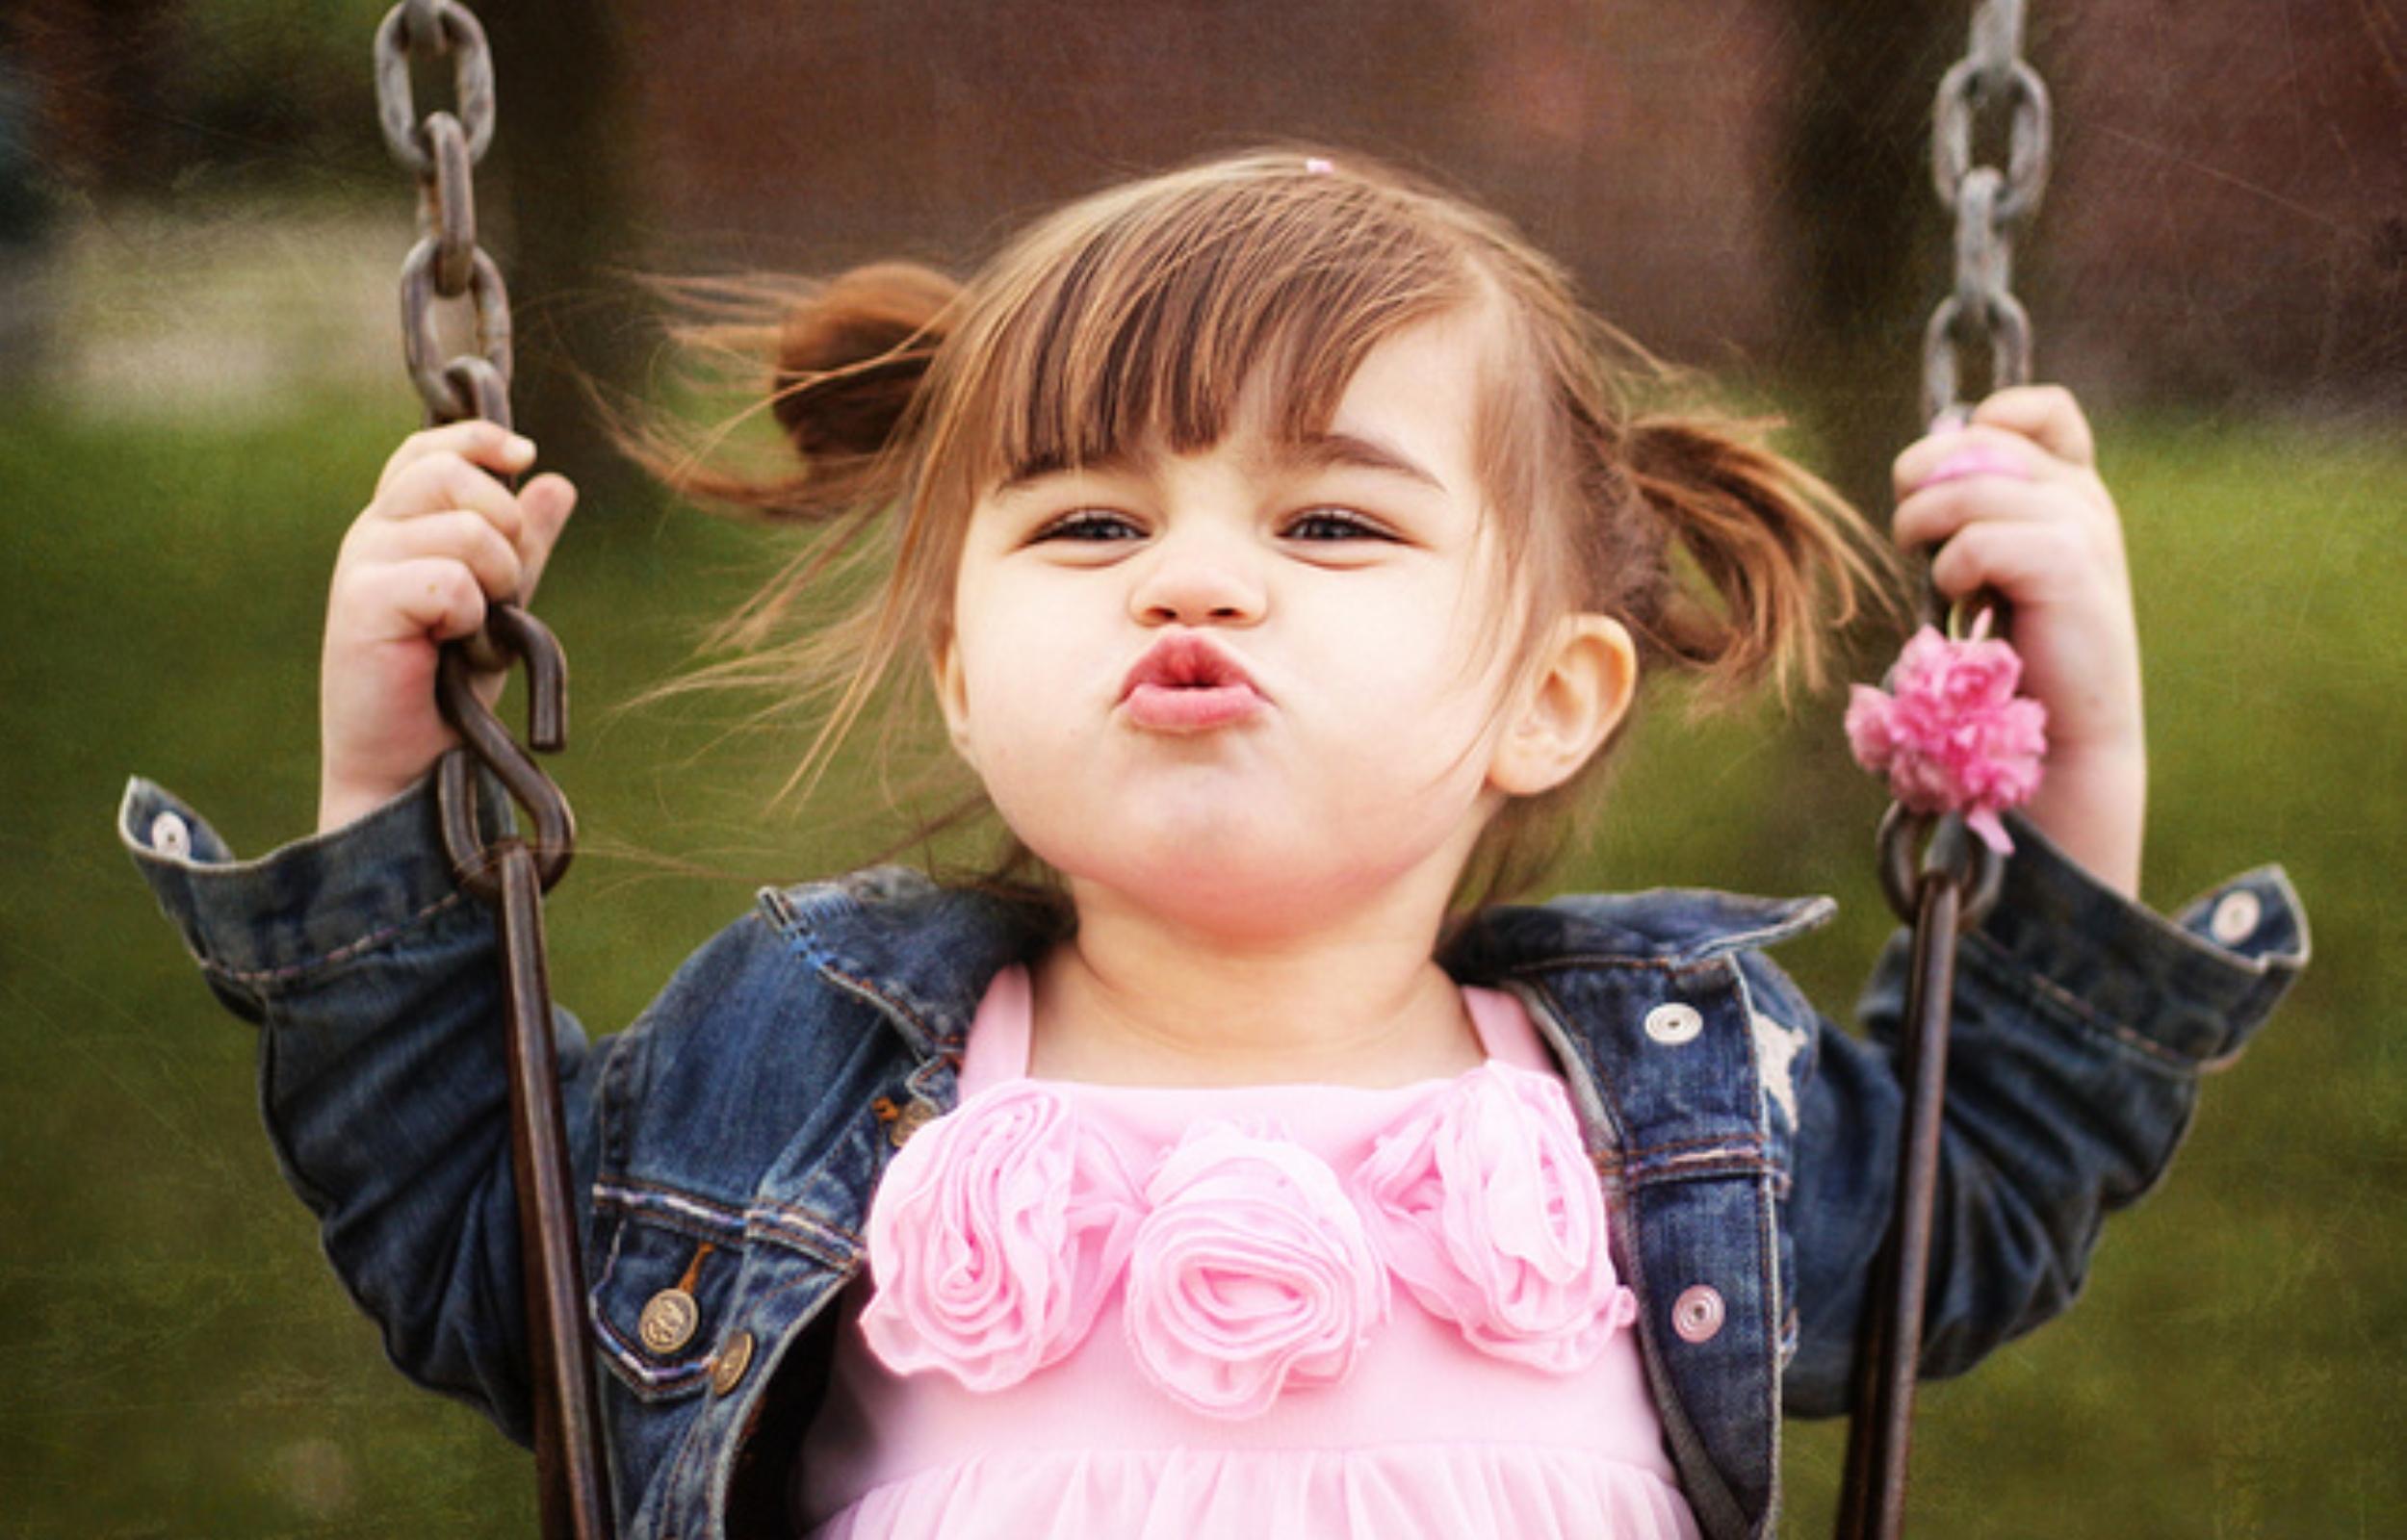 Cute Baby Girl Pictures Wallpapers - WallpaperSafari